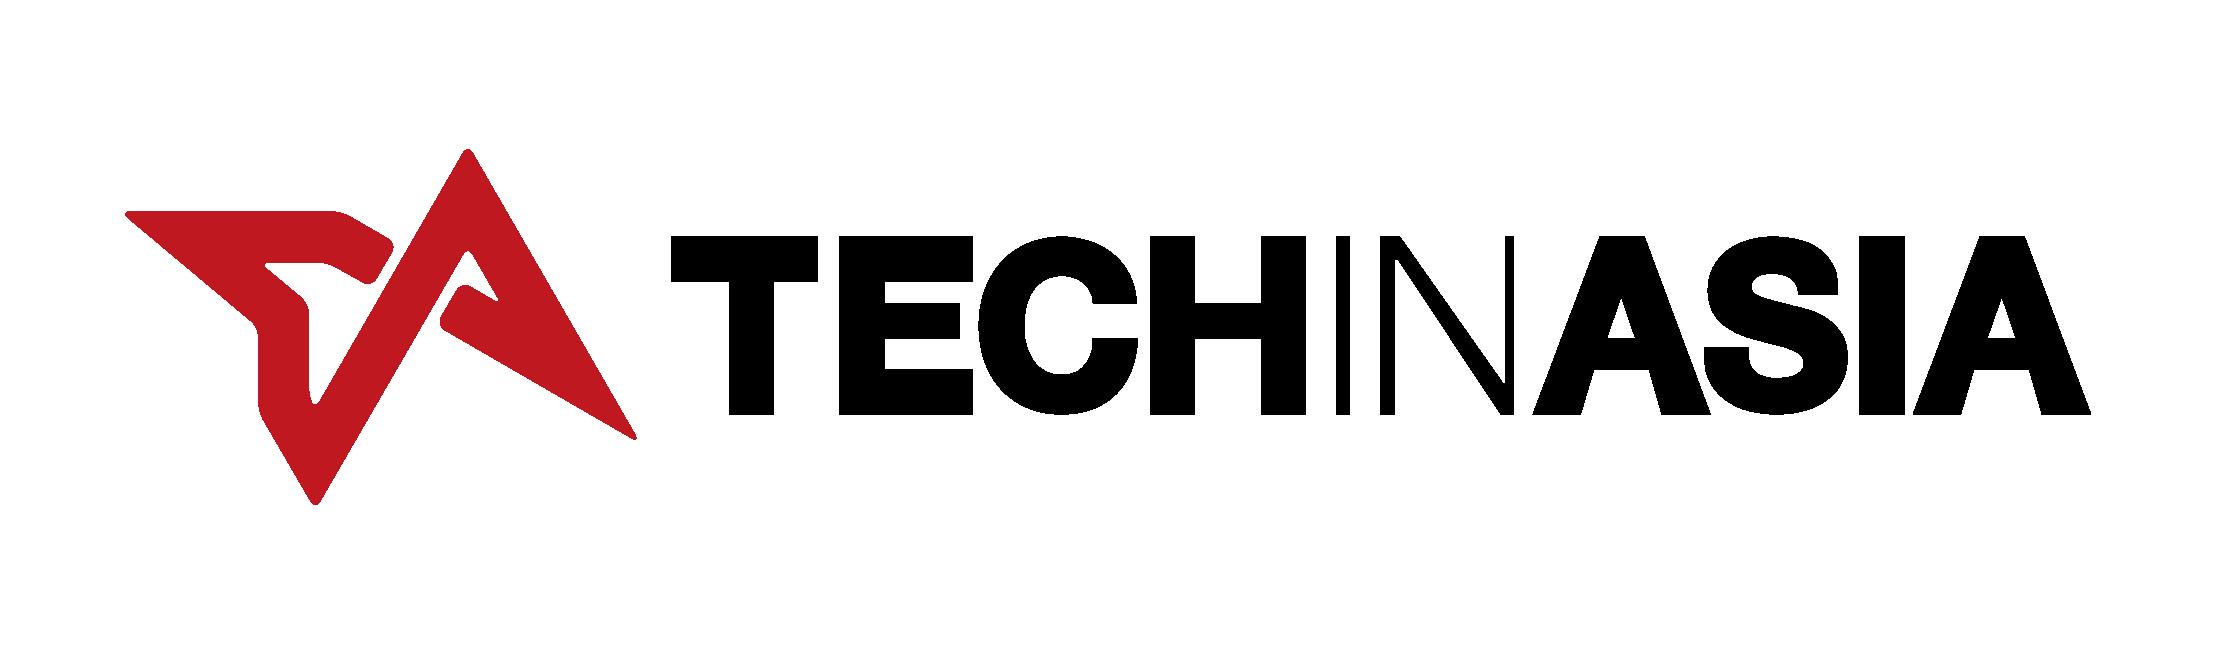 TiA-logo-horizontal_red_black-on-trans.png